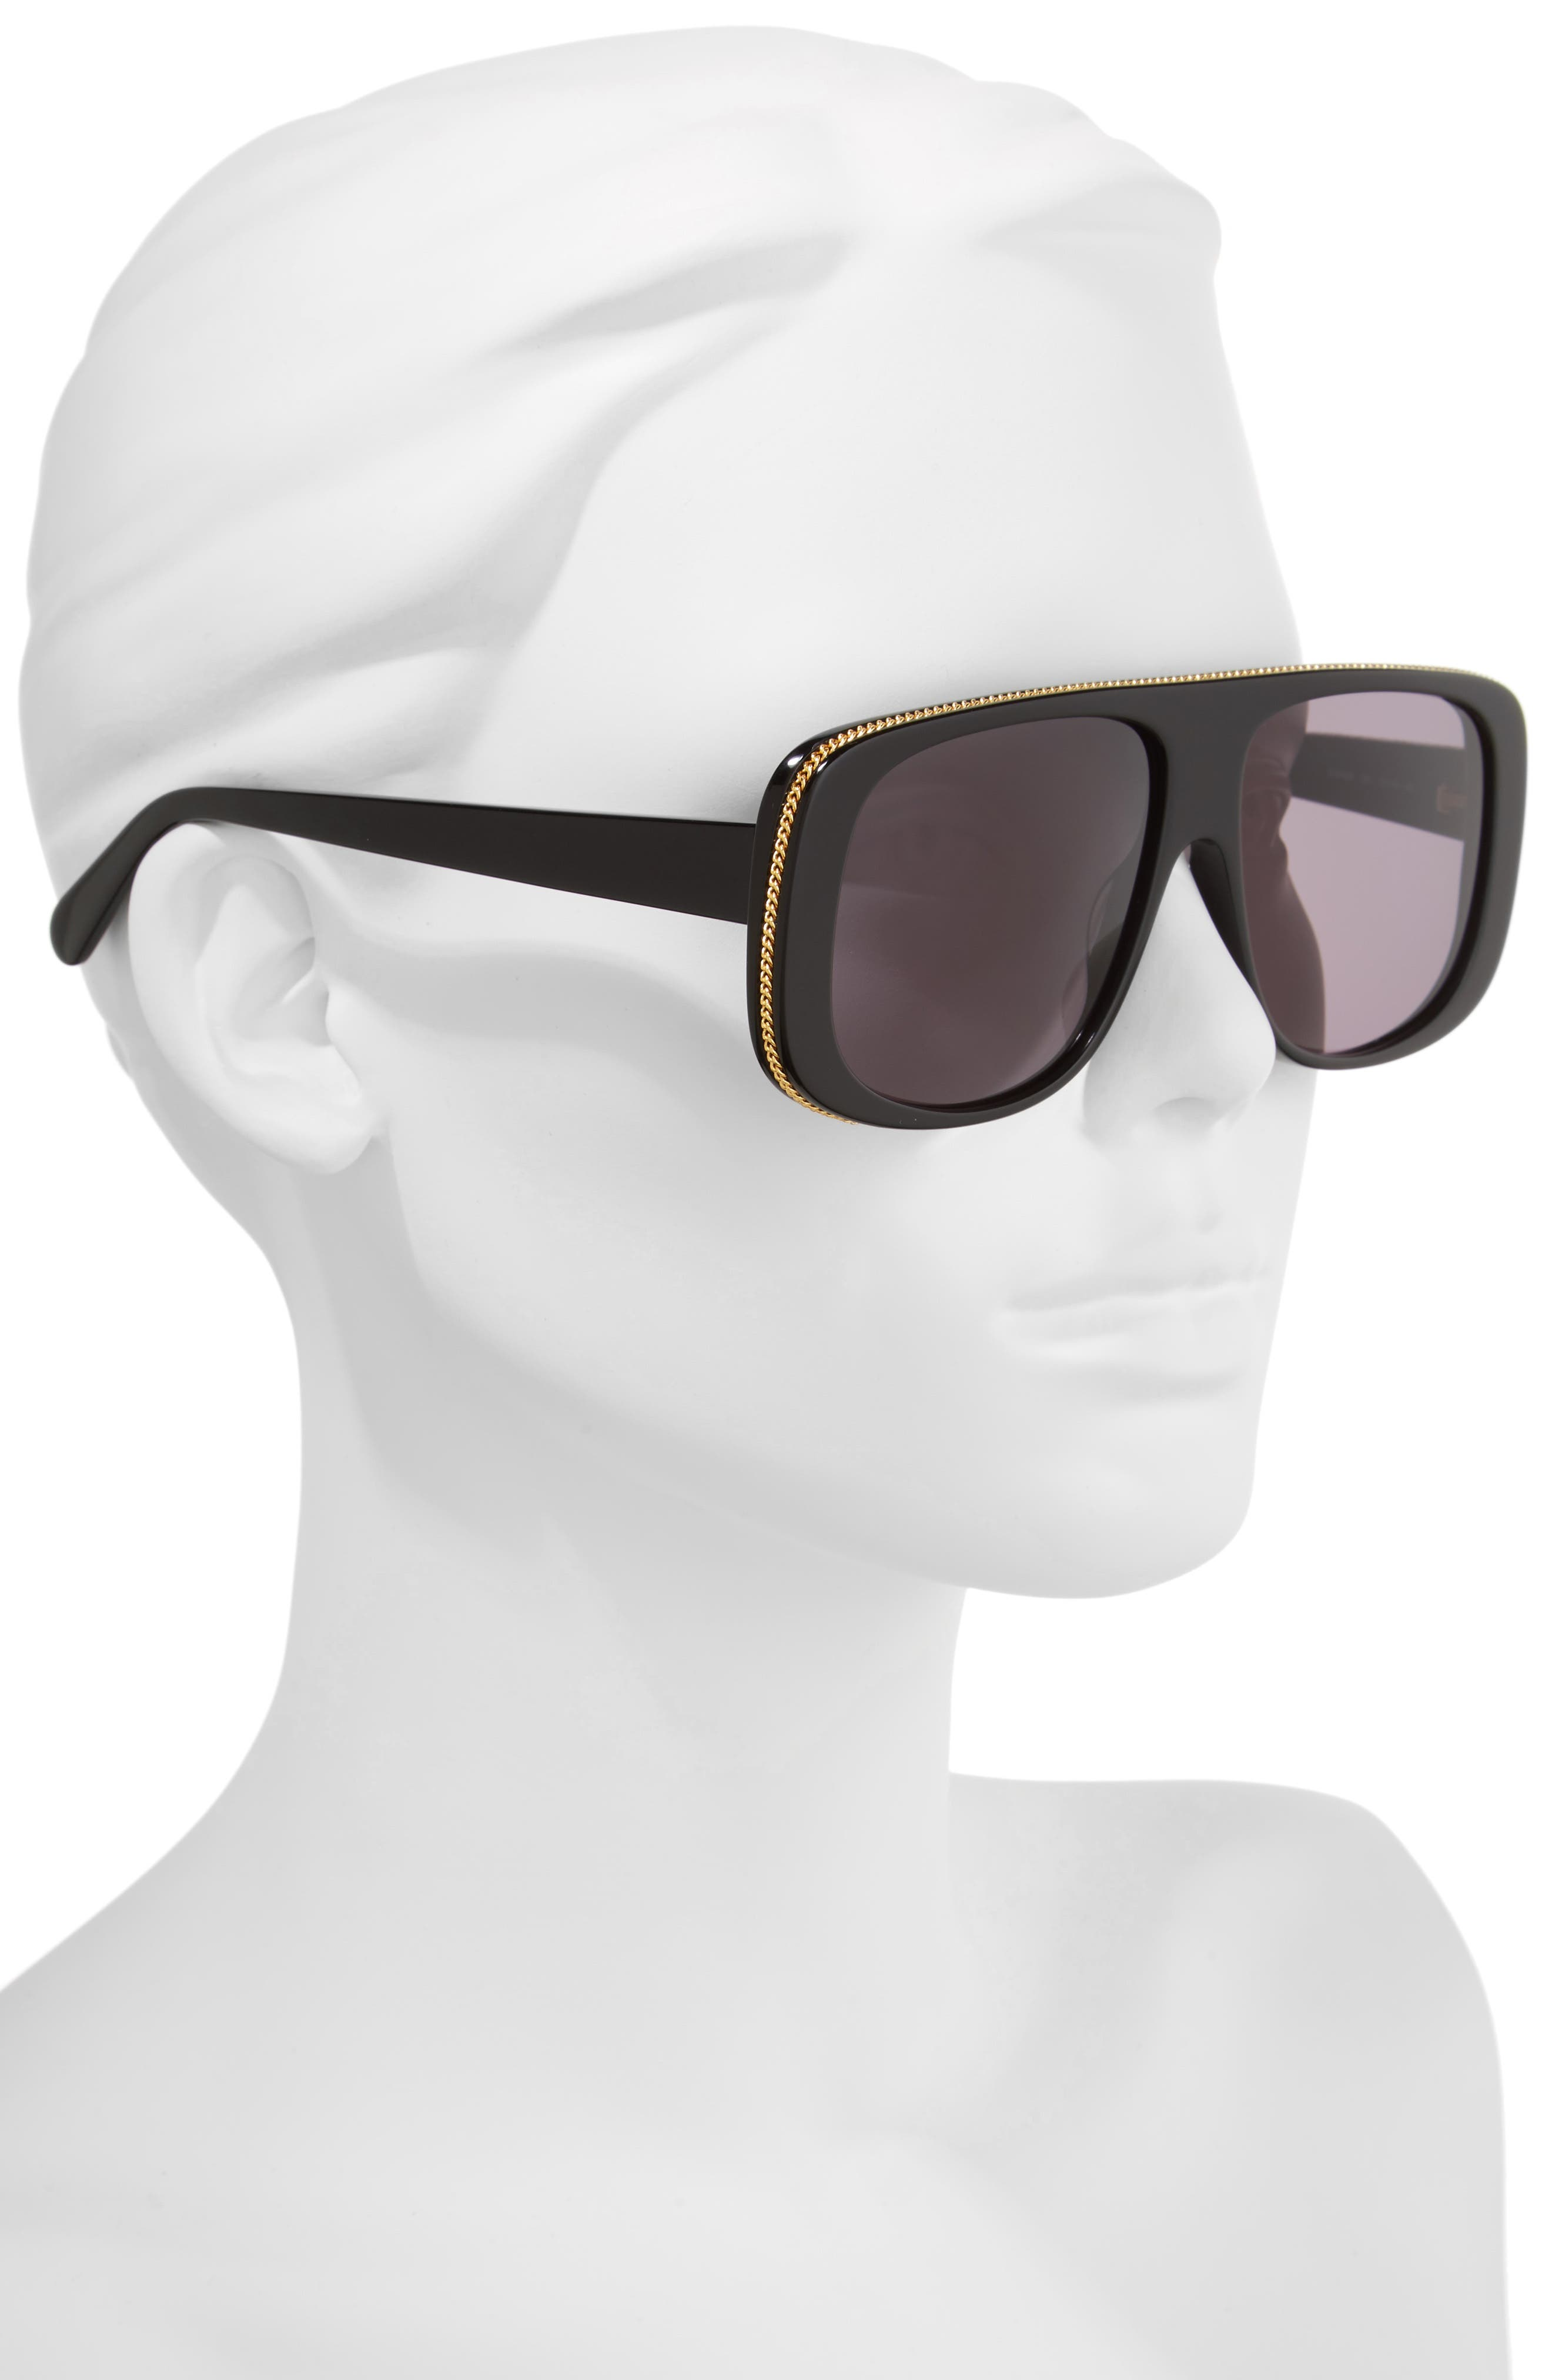 57mm Flat Top Sunglasses,                             Alternate thumbnail 2, color,                             BLACK/ GREY